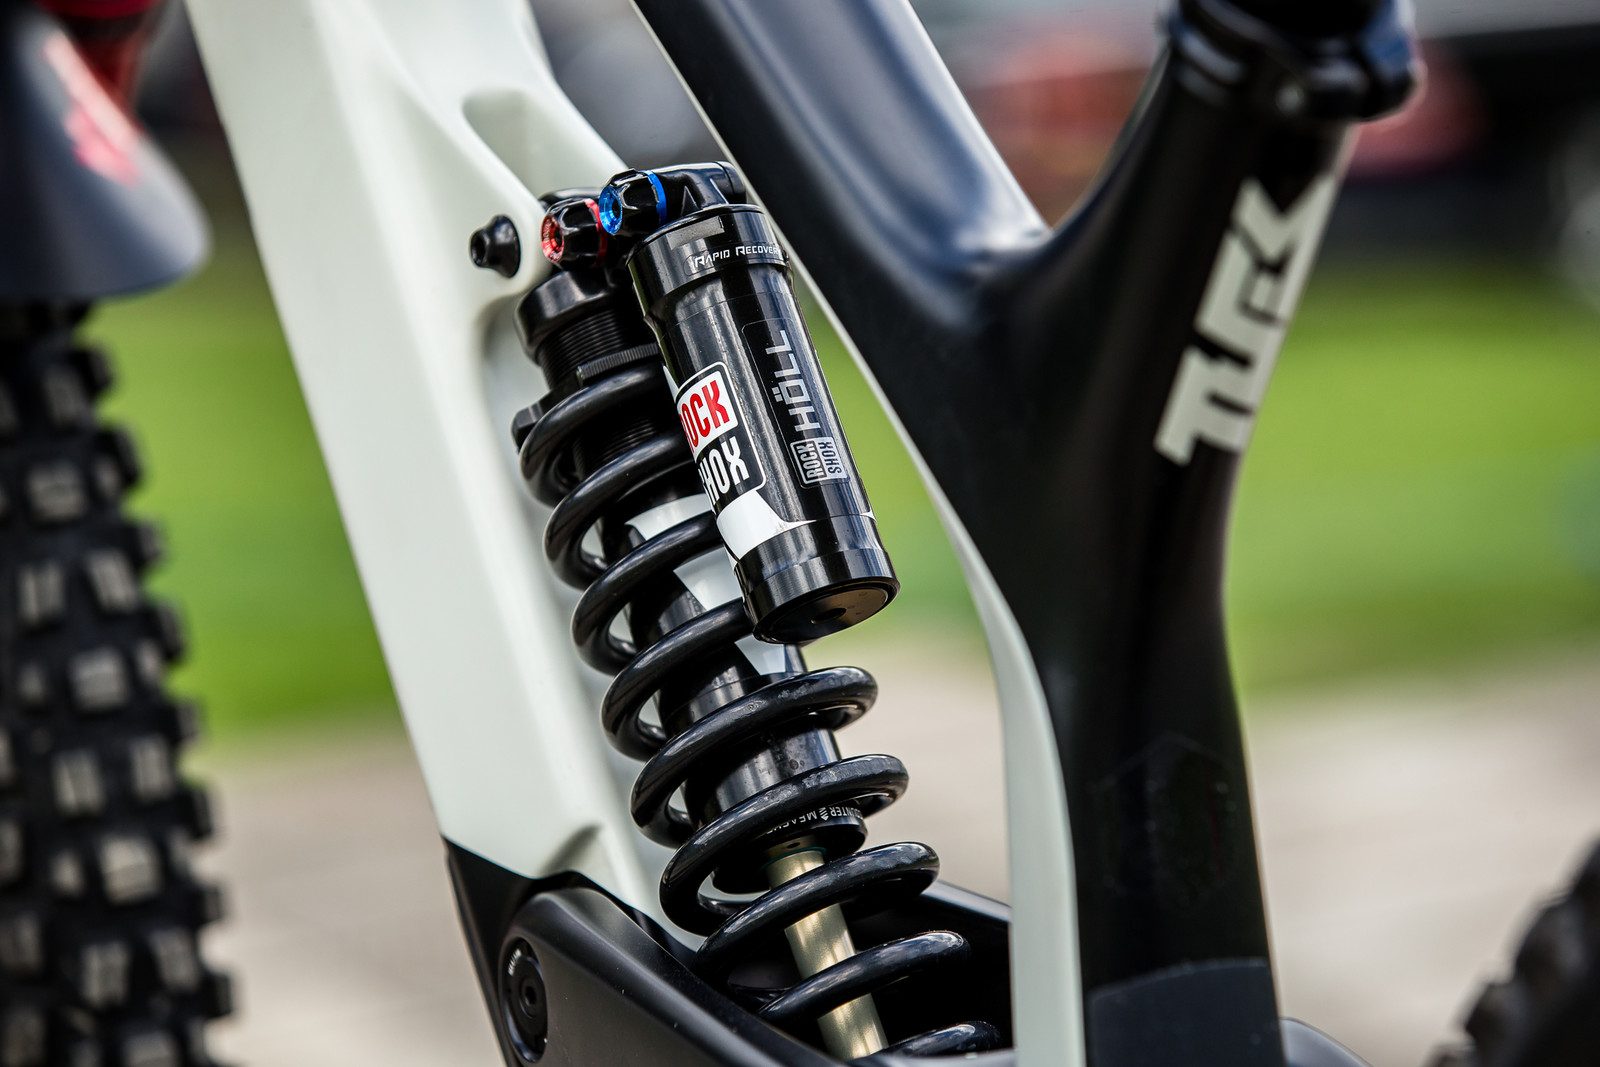 RockShox Vivid R2C Coil - WINNING BIKE - Vali Höll's YT TUES - Mountain Biking Pictures - Vital MTB